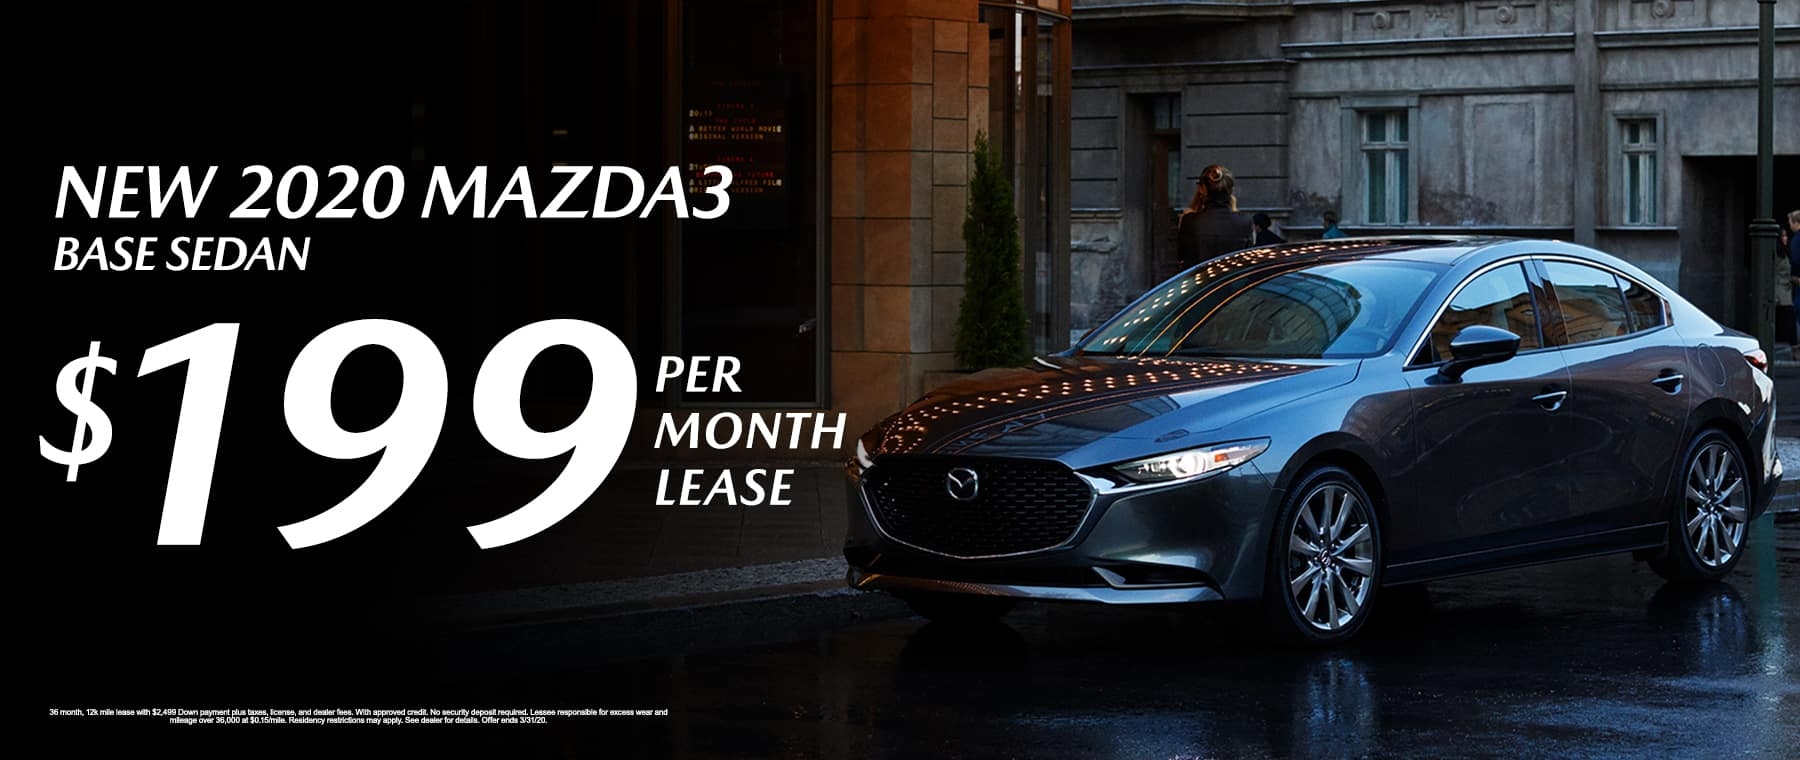 New 2020 Mazda3 Base Sedan Lease for $199/mo.